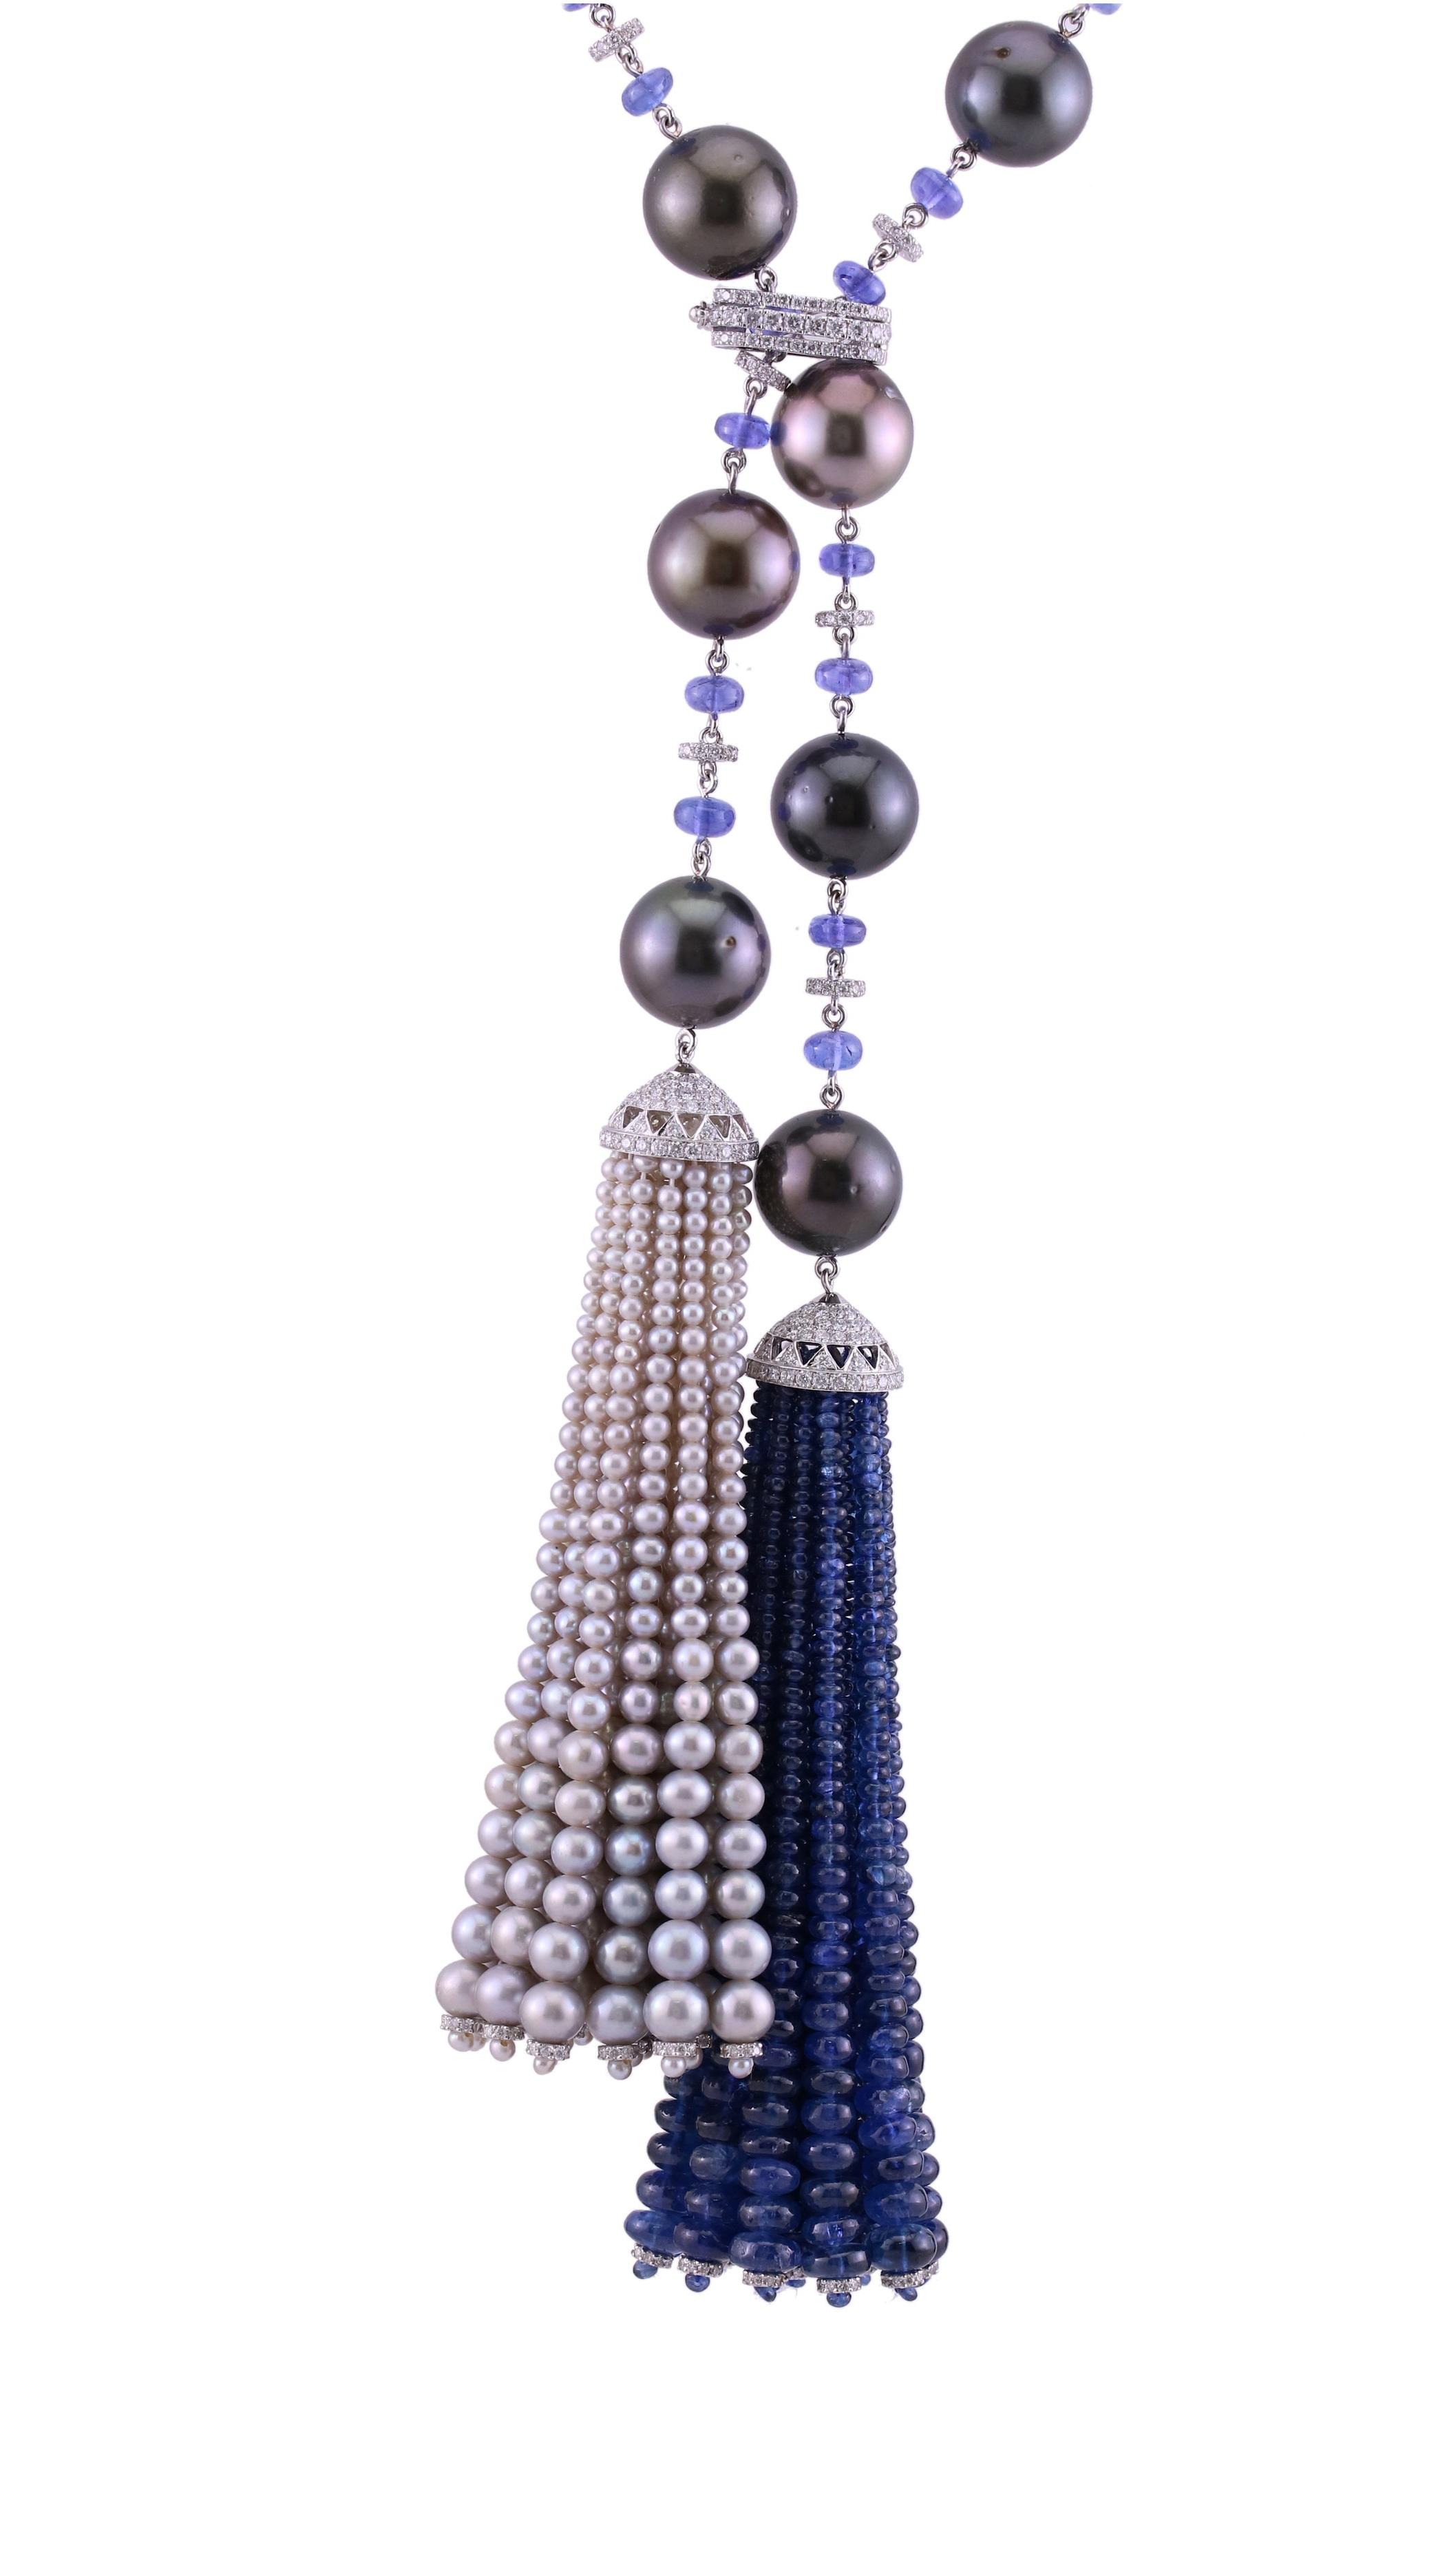 Stones:   -White Diamond Round Full Cut  -Emerald  -Grey Pearl  -Pearl Tahitian  -Tanzanite